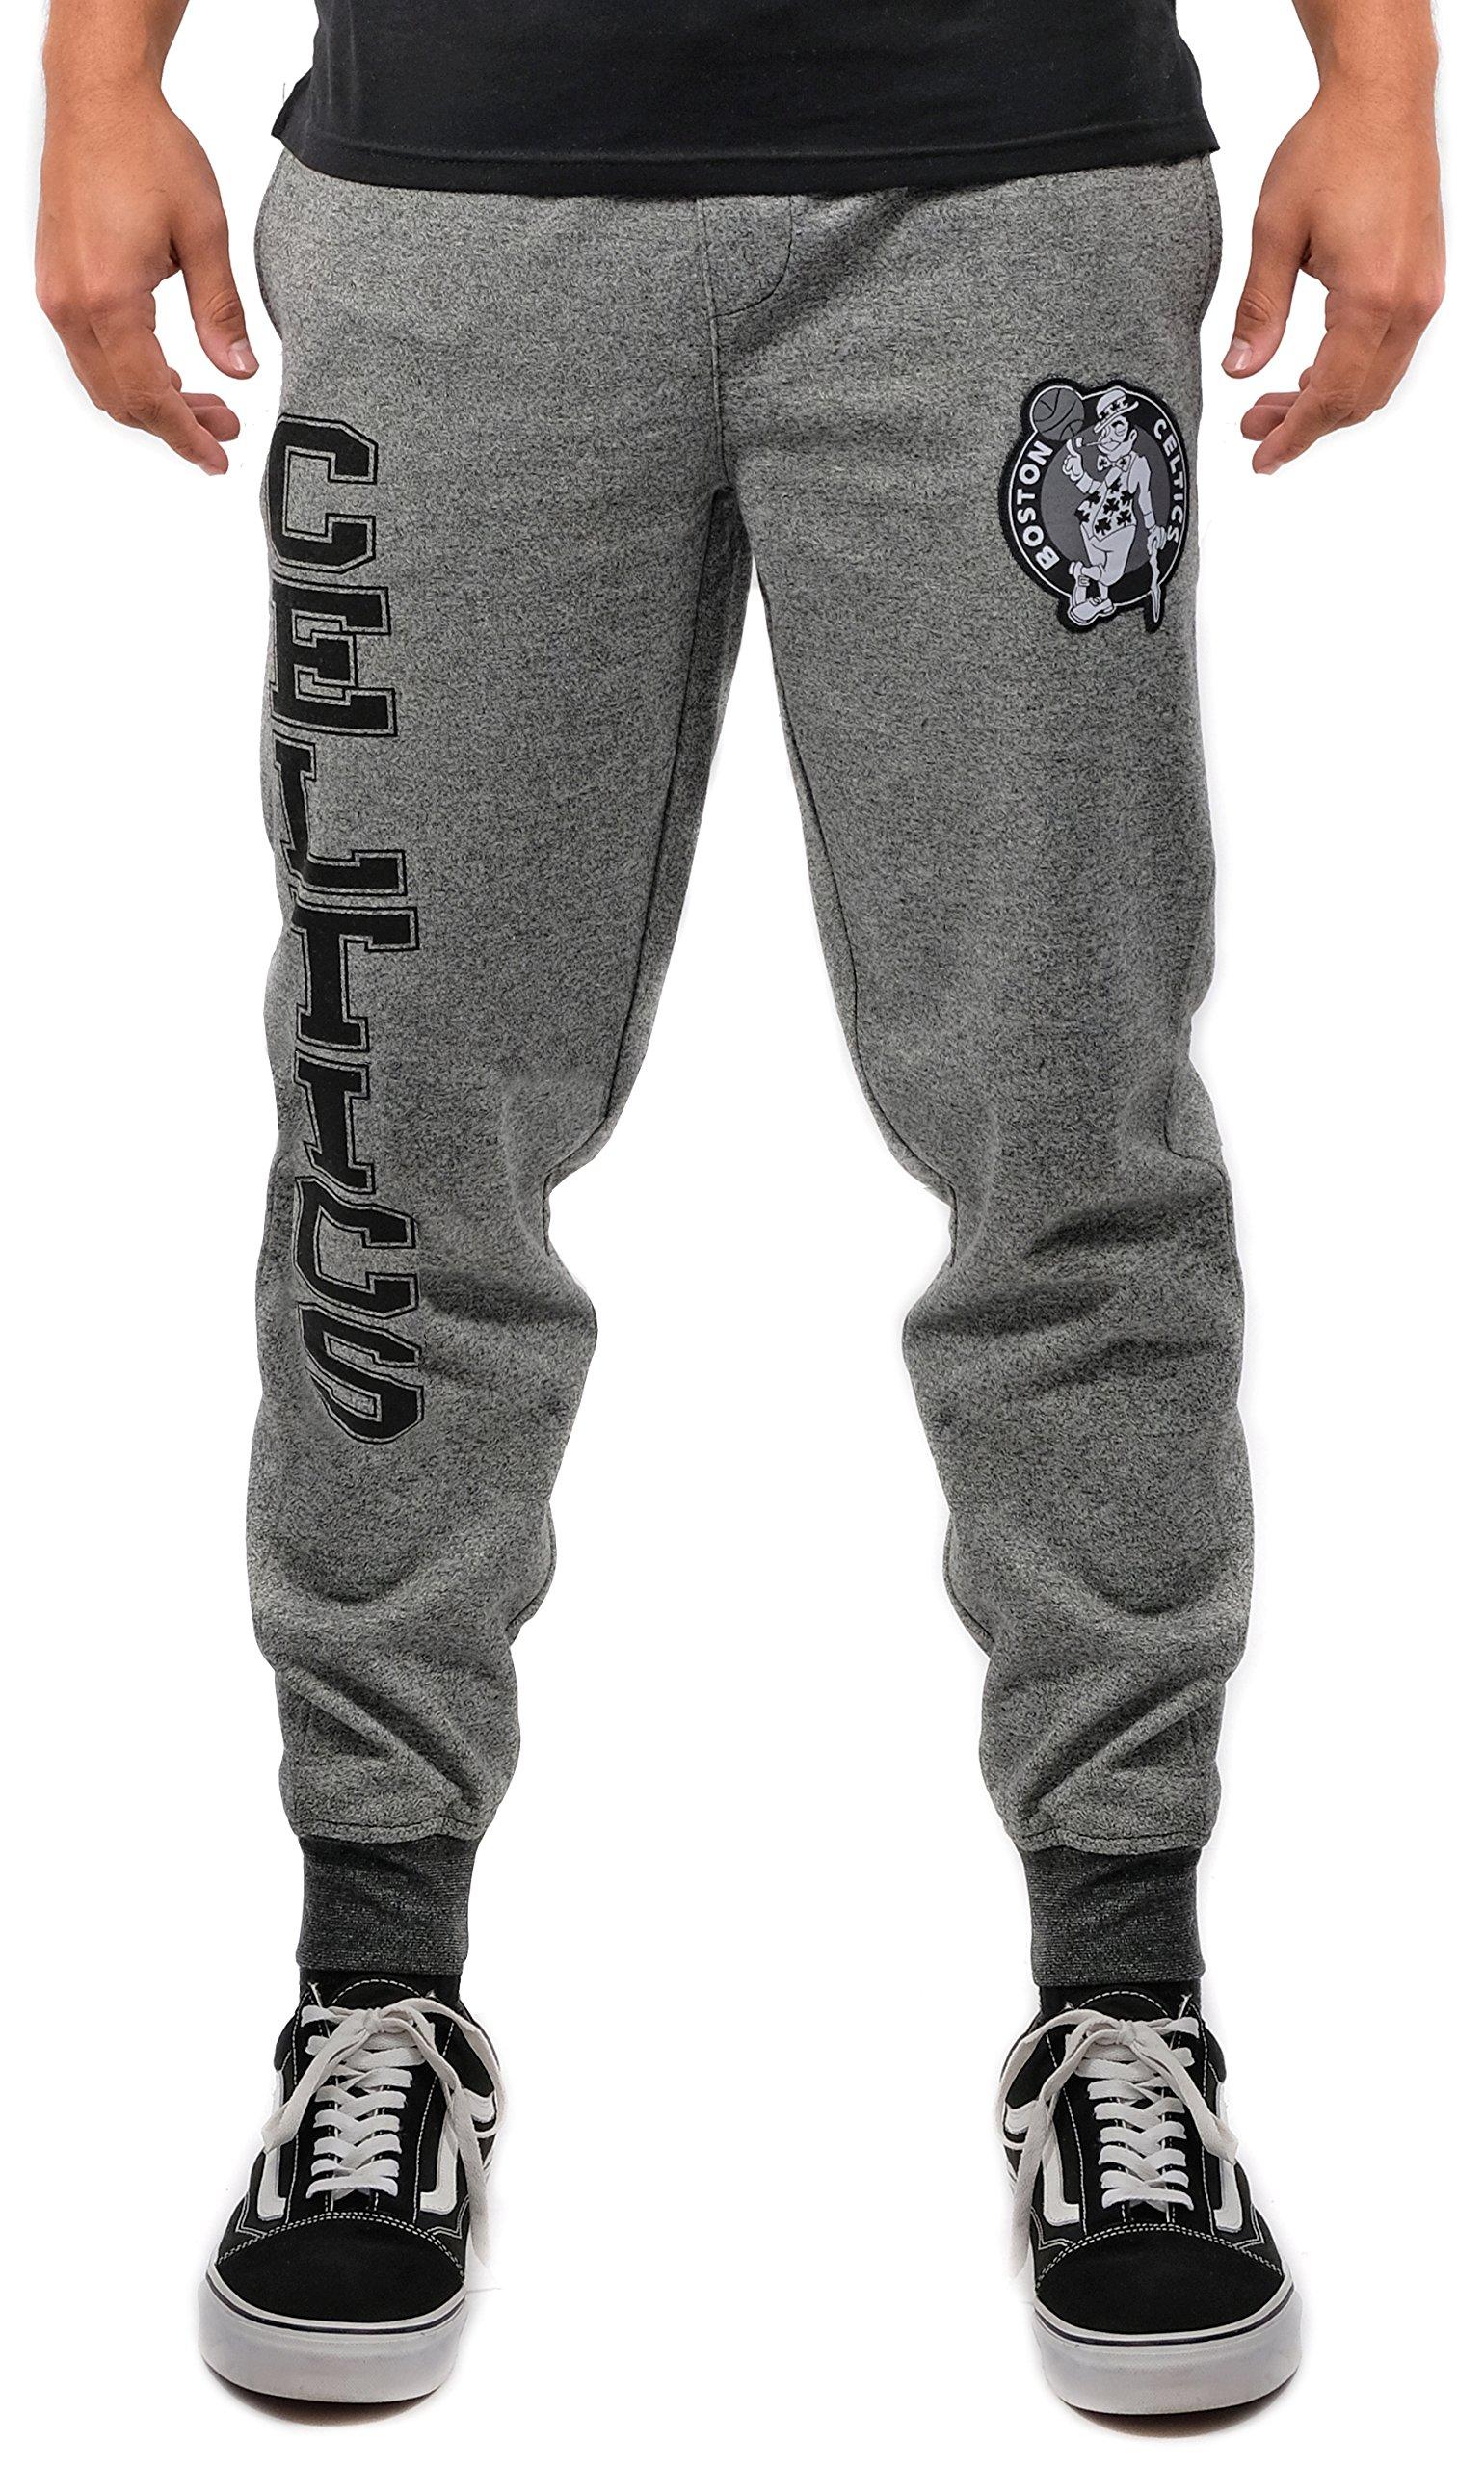 UNK NBA Men's Jogger Pants Varsity Stripe Rib Marl Fleece Sweatpants, Team Logo Gray